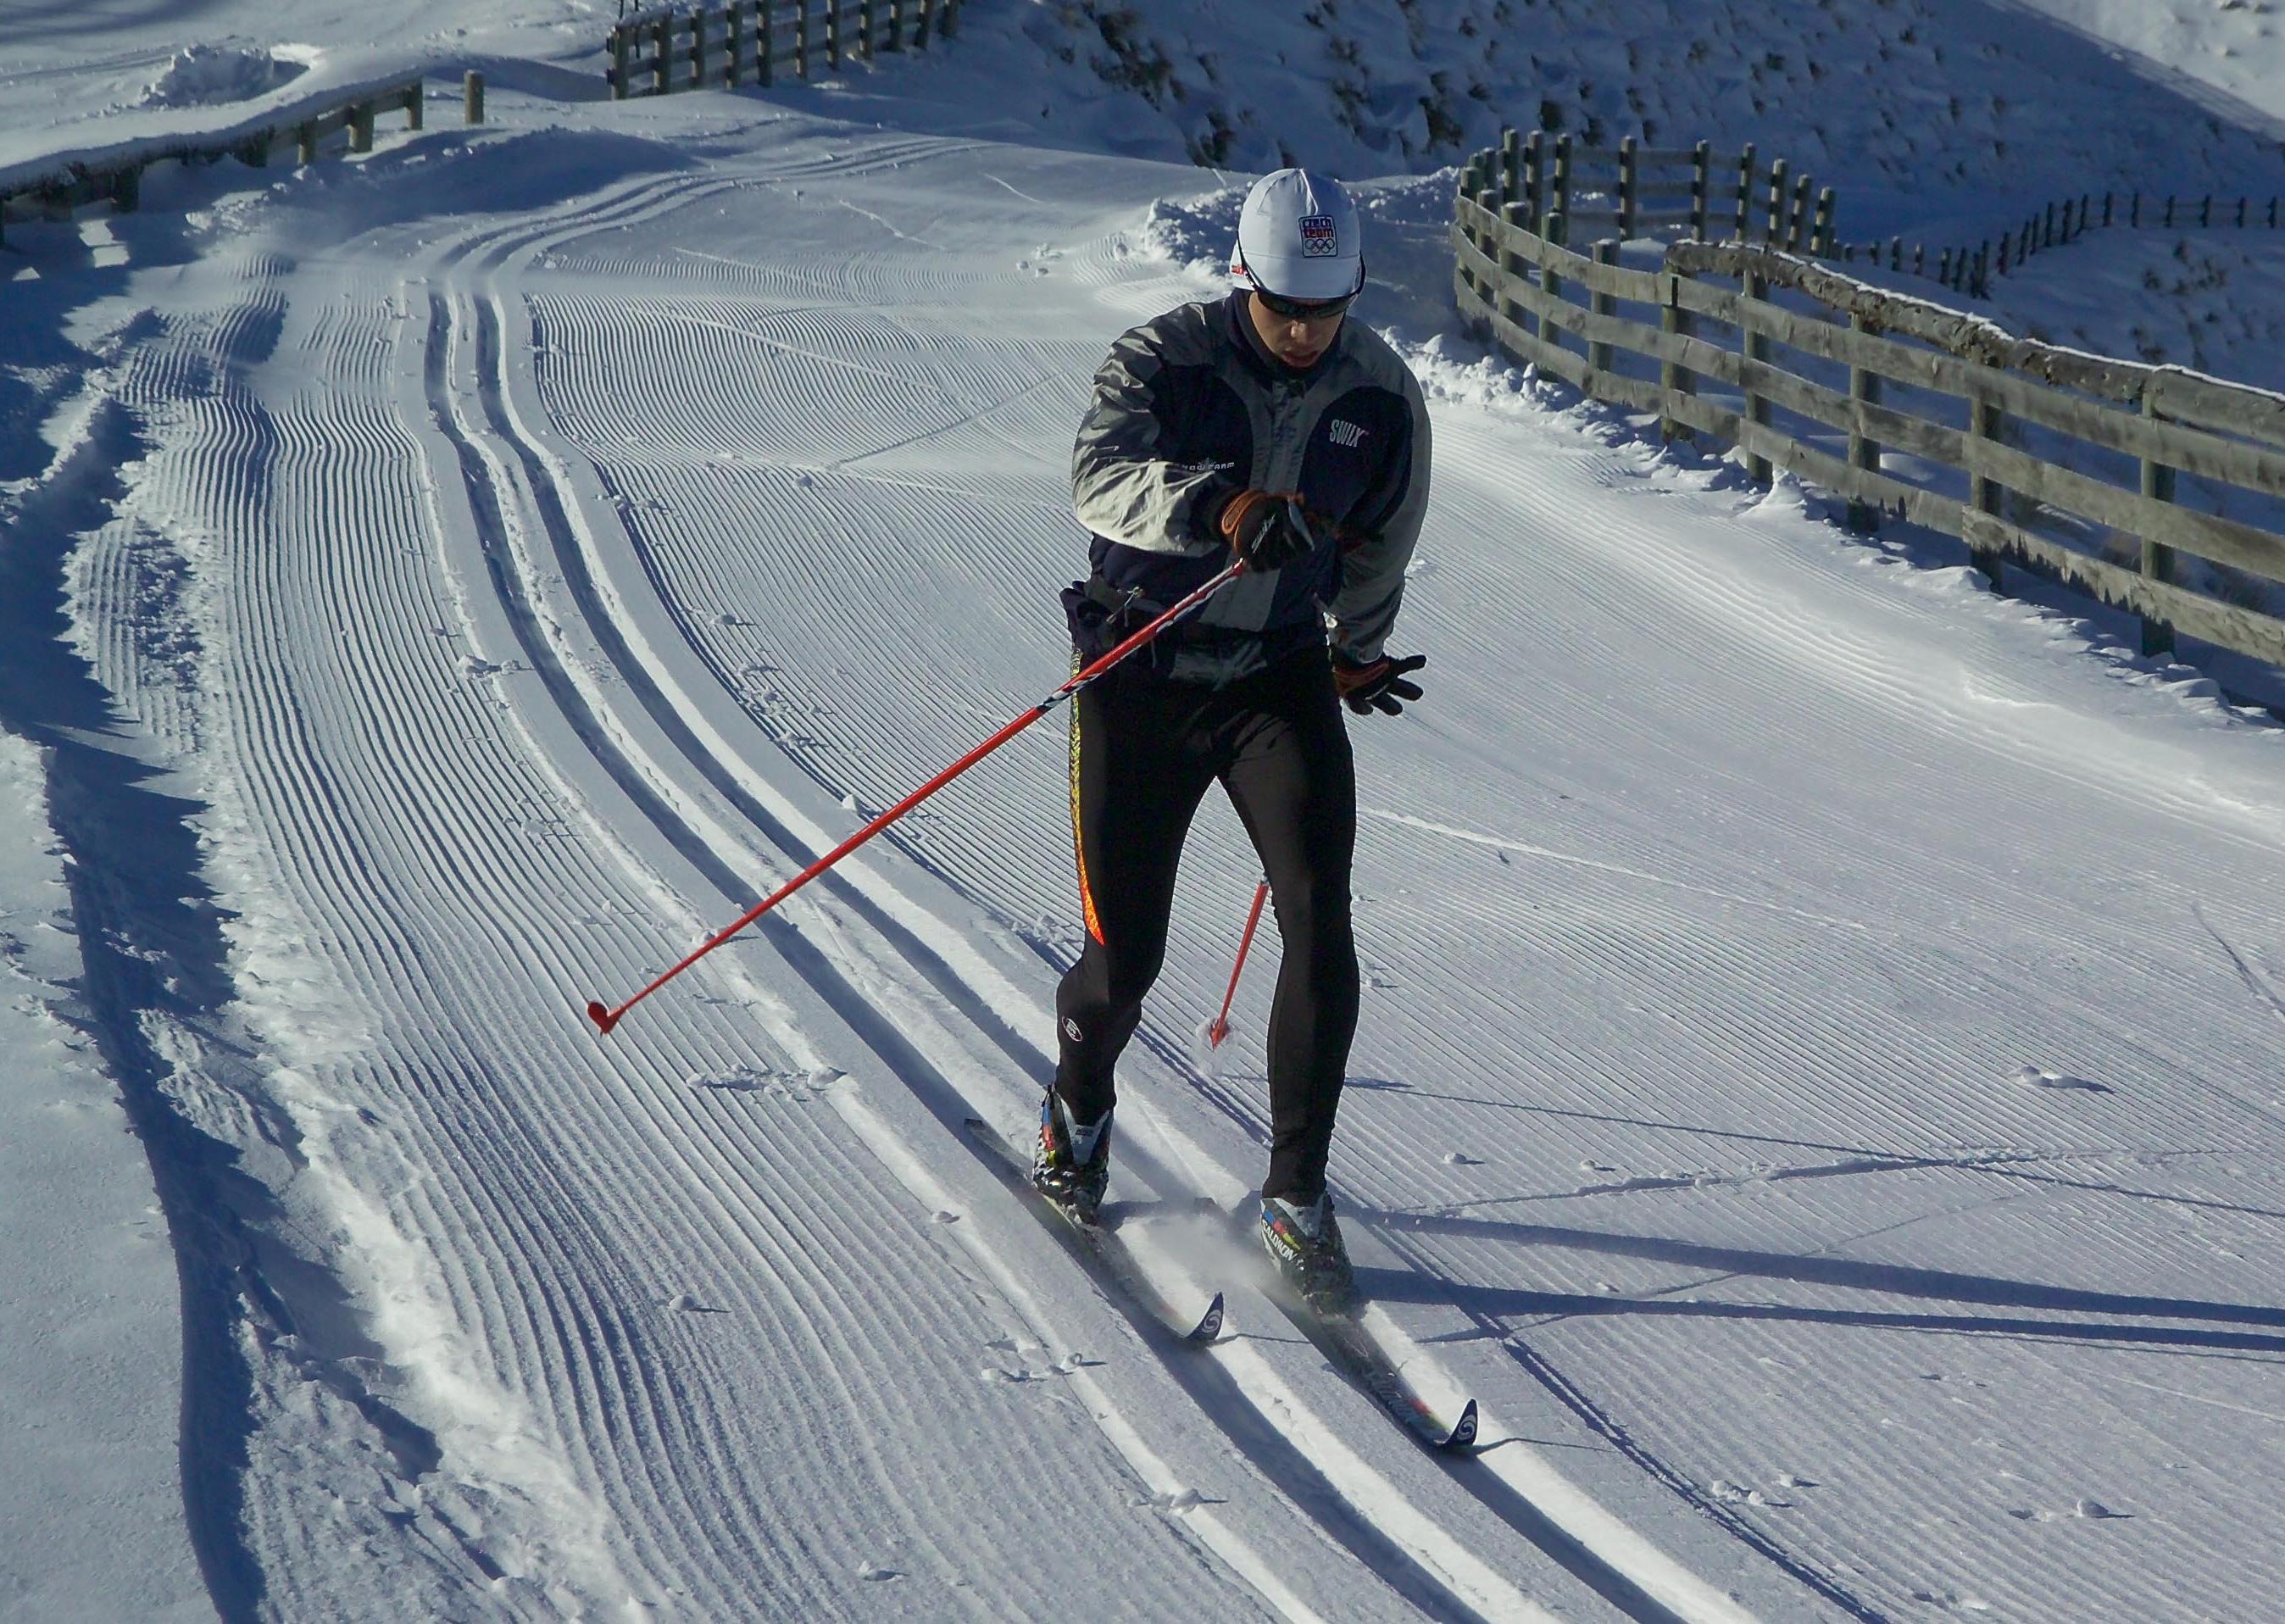 Classic Skiing Snow Farm 2010